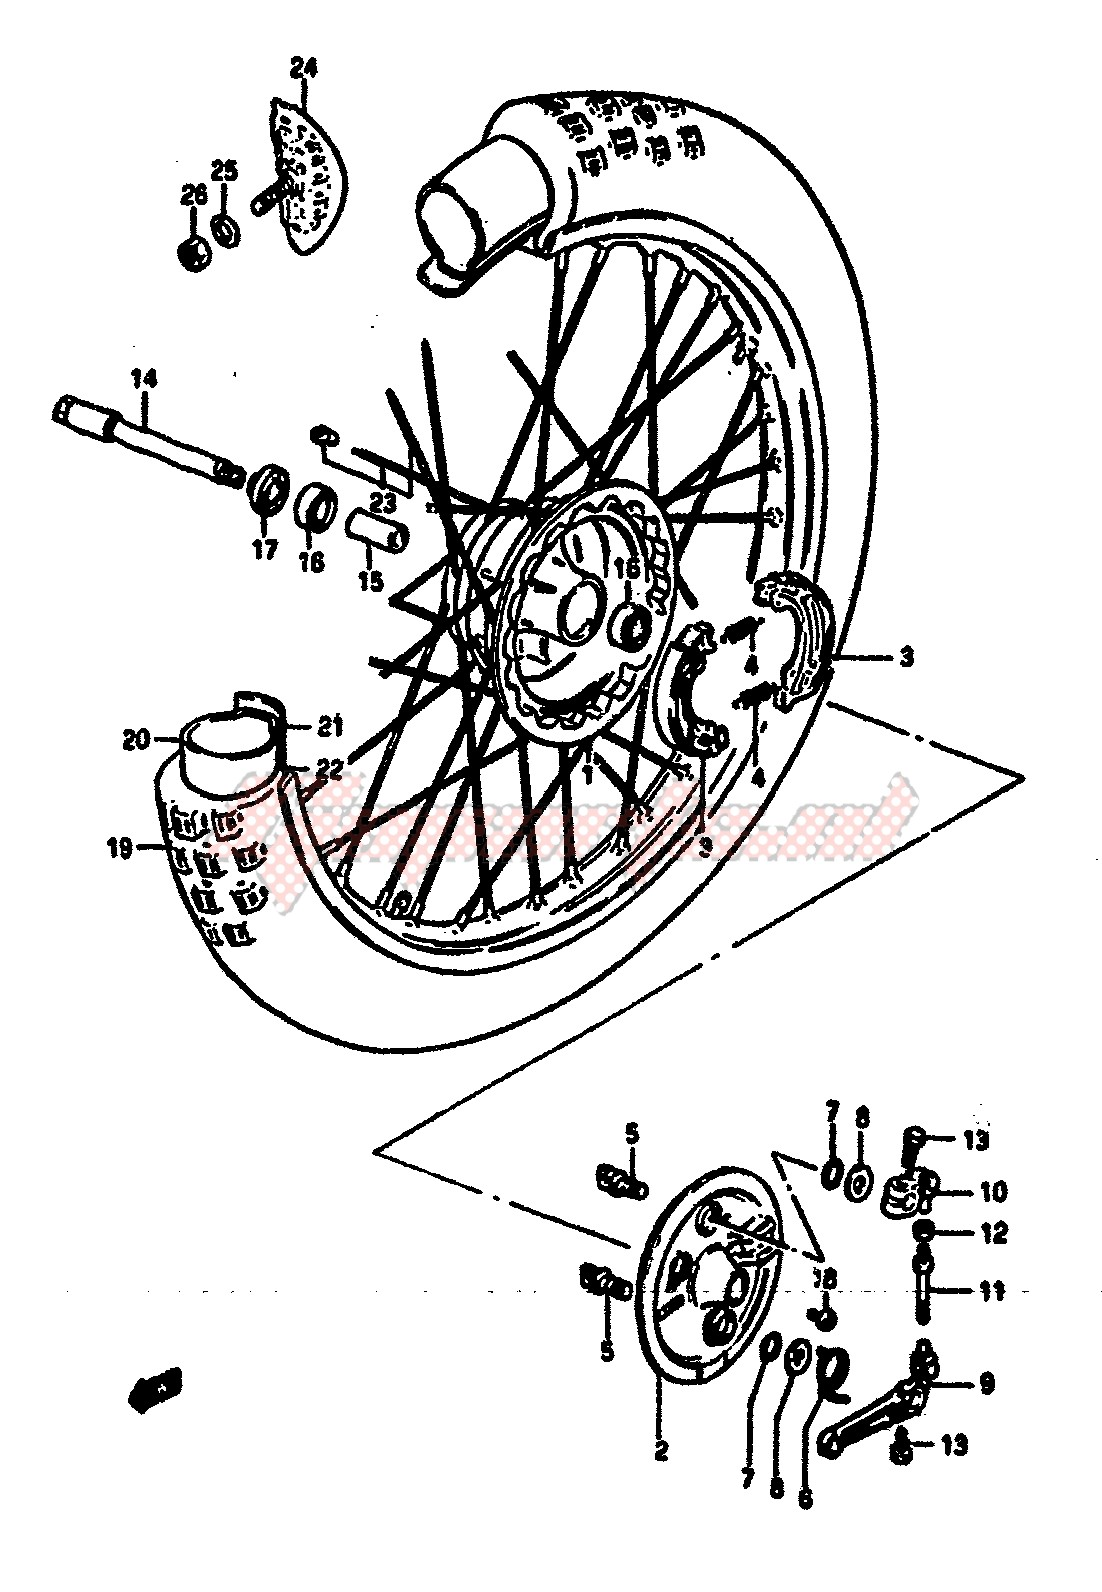 FRONT WHEEL (MODEL E) image